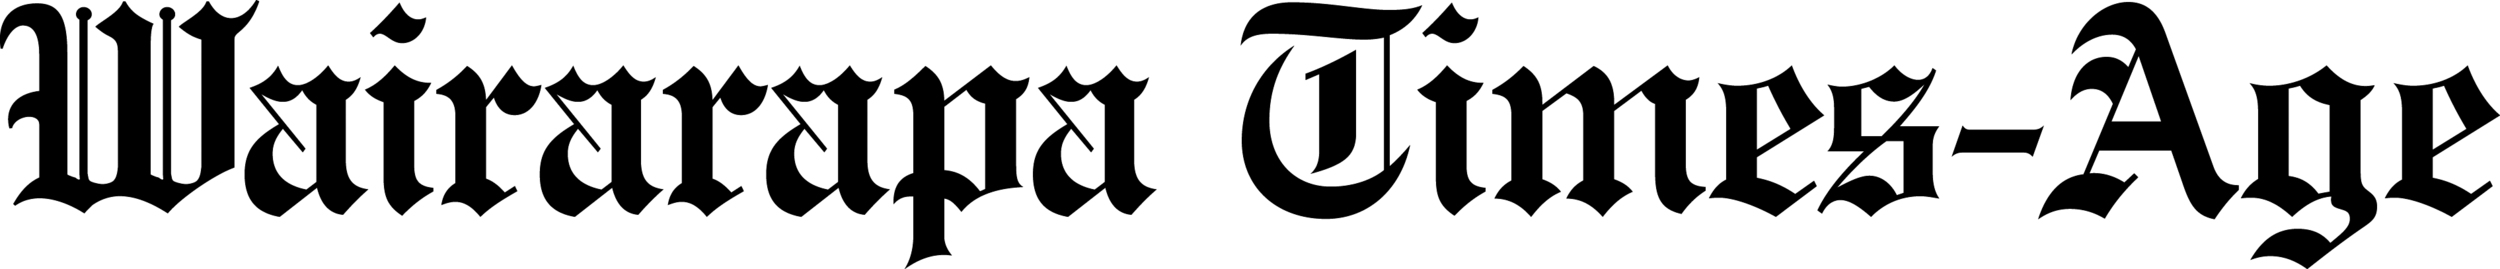 Wairarapa Times age - 6th February 2016